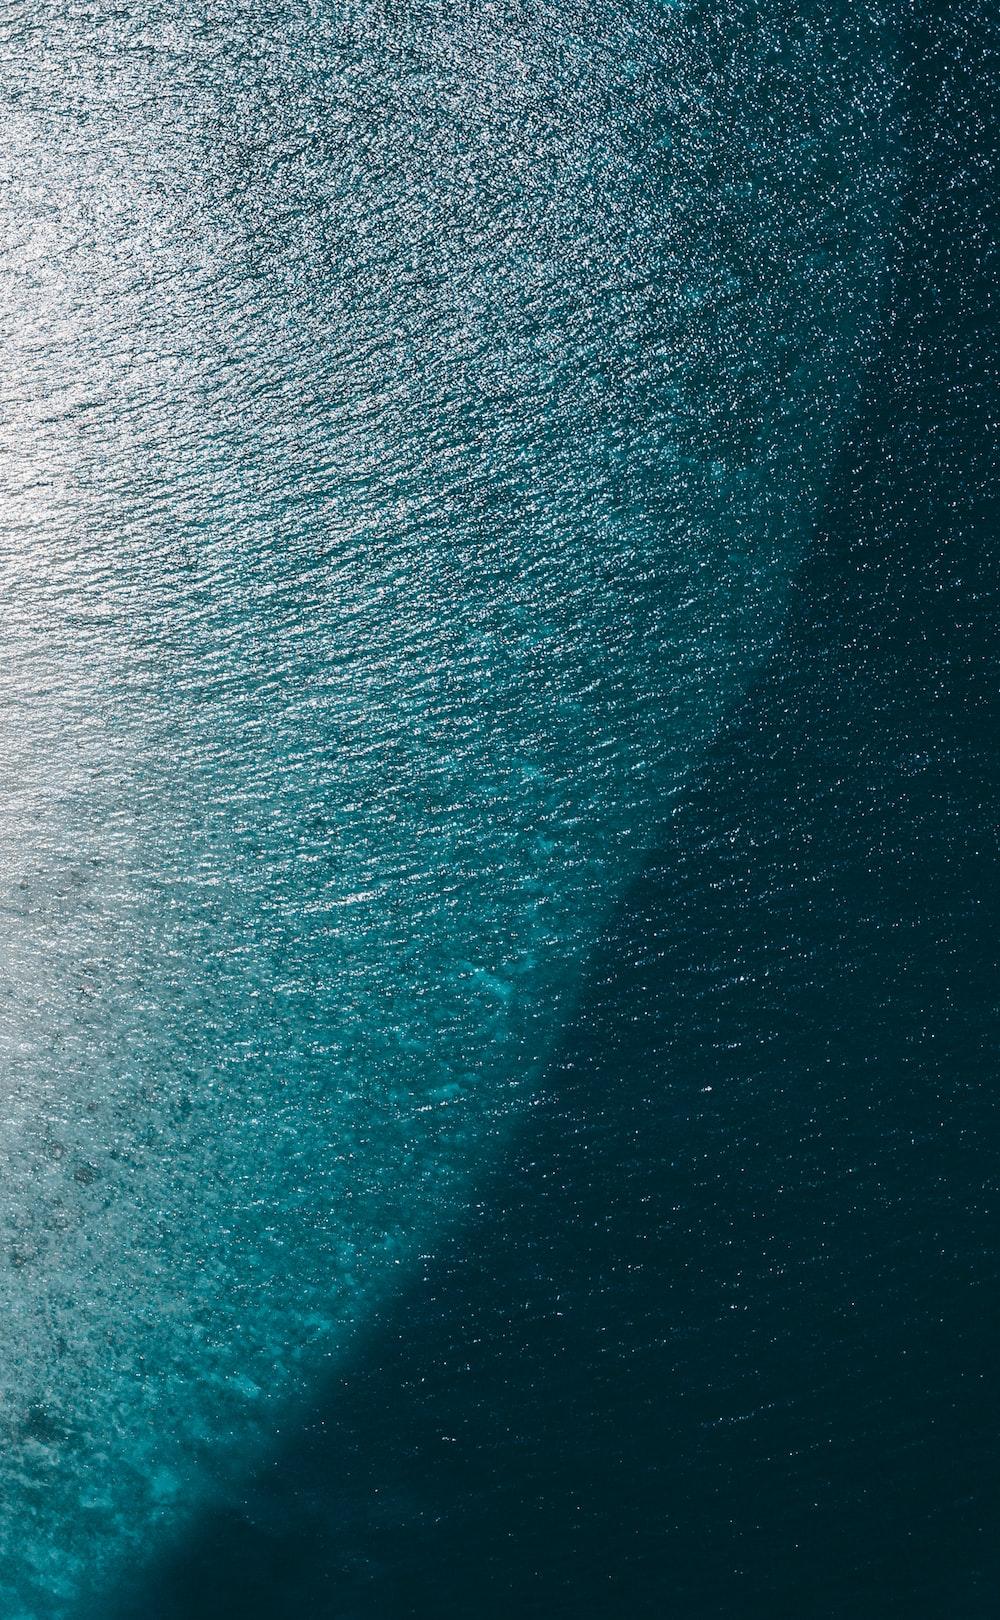 close up photo of blue textile